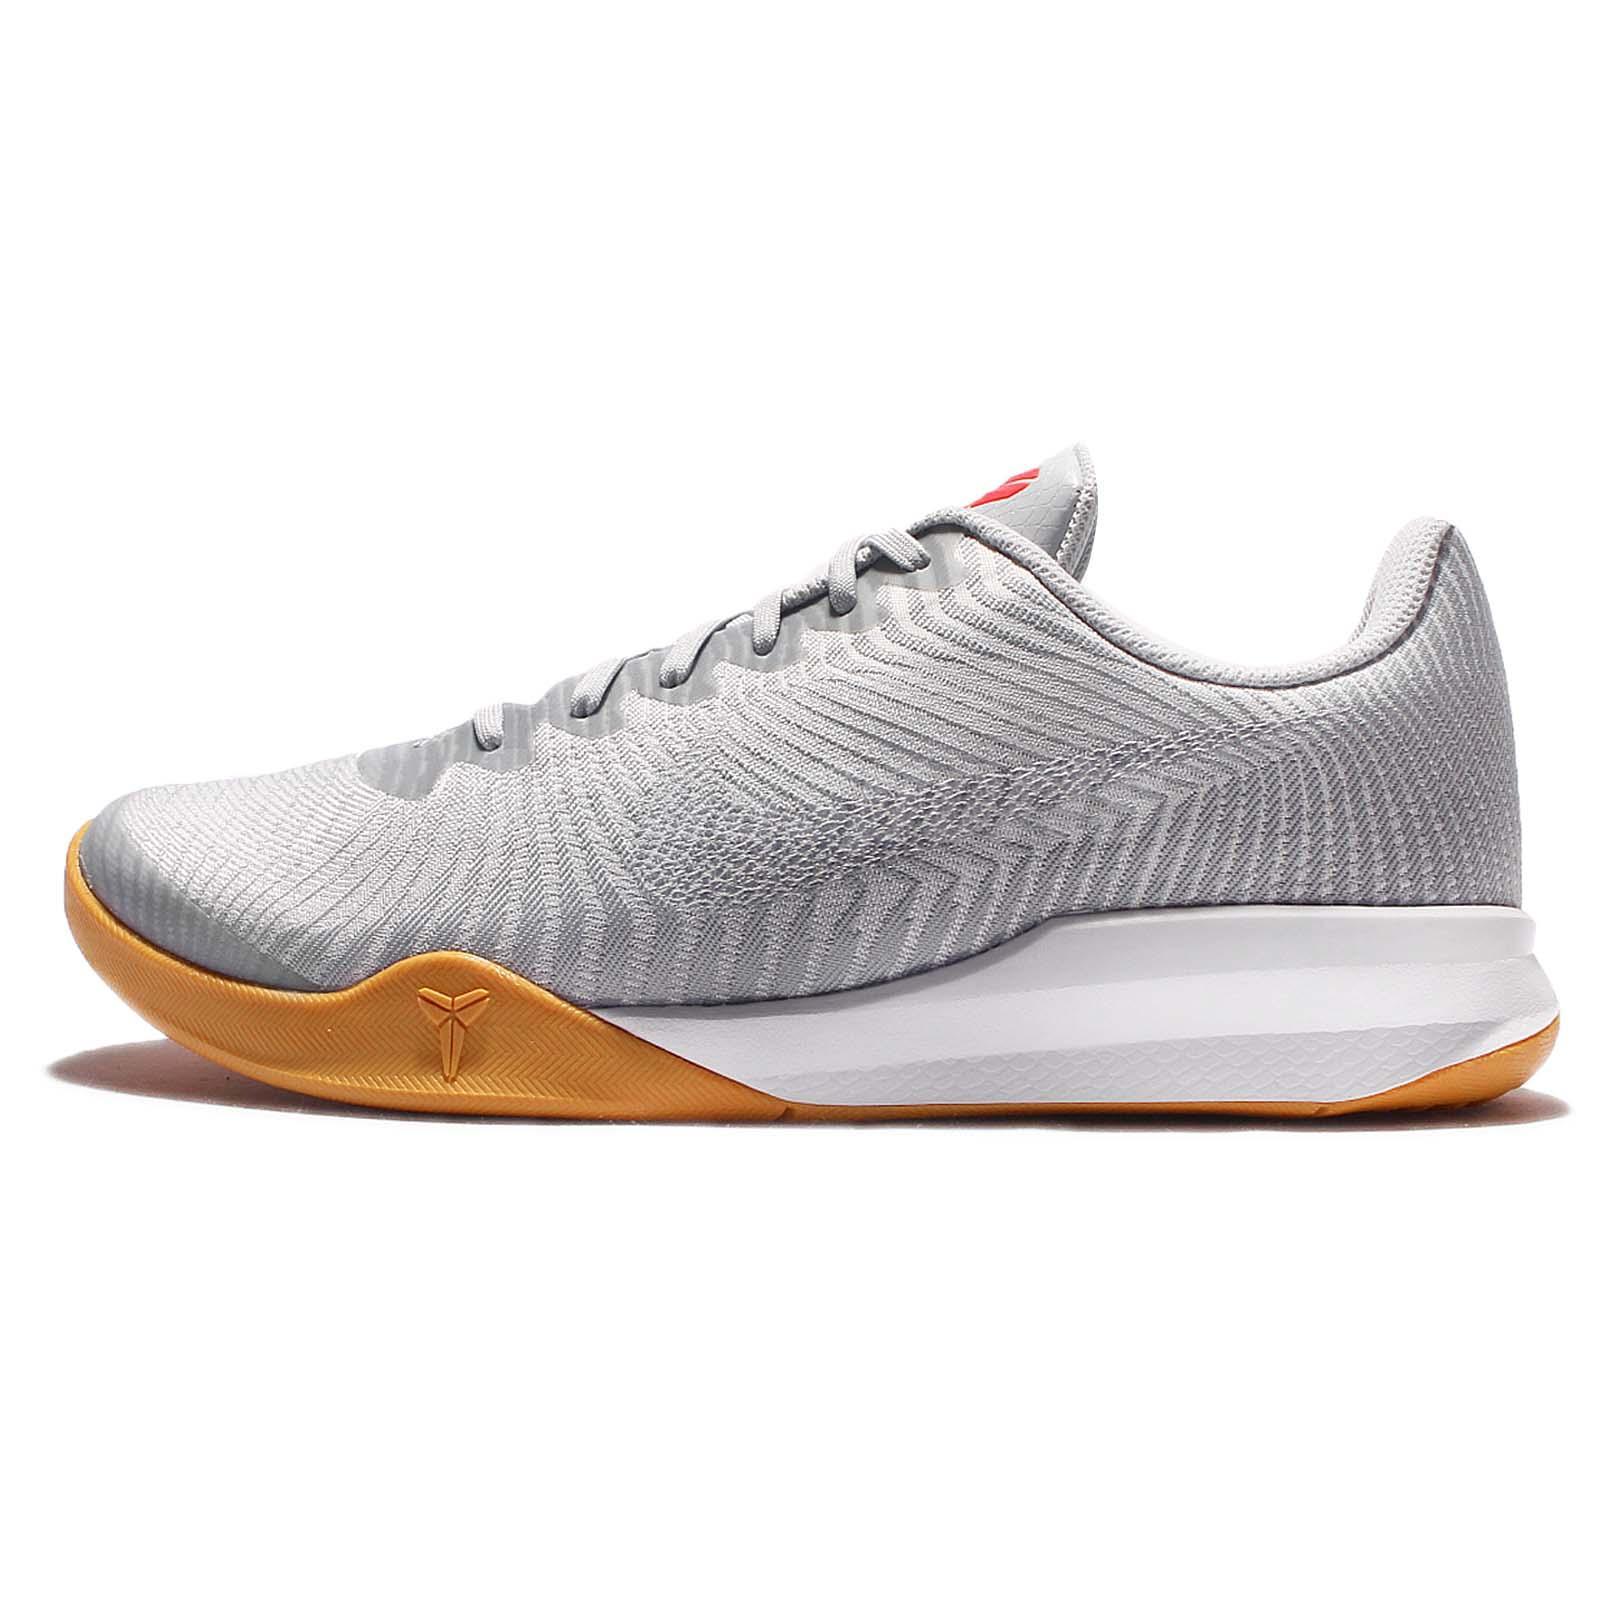 Kb Mentality White Basketball Shoes